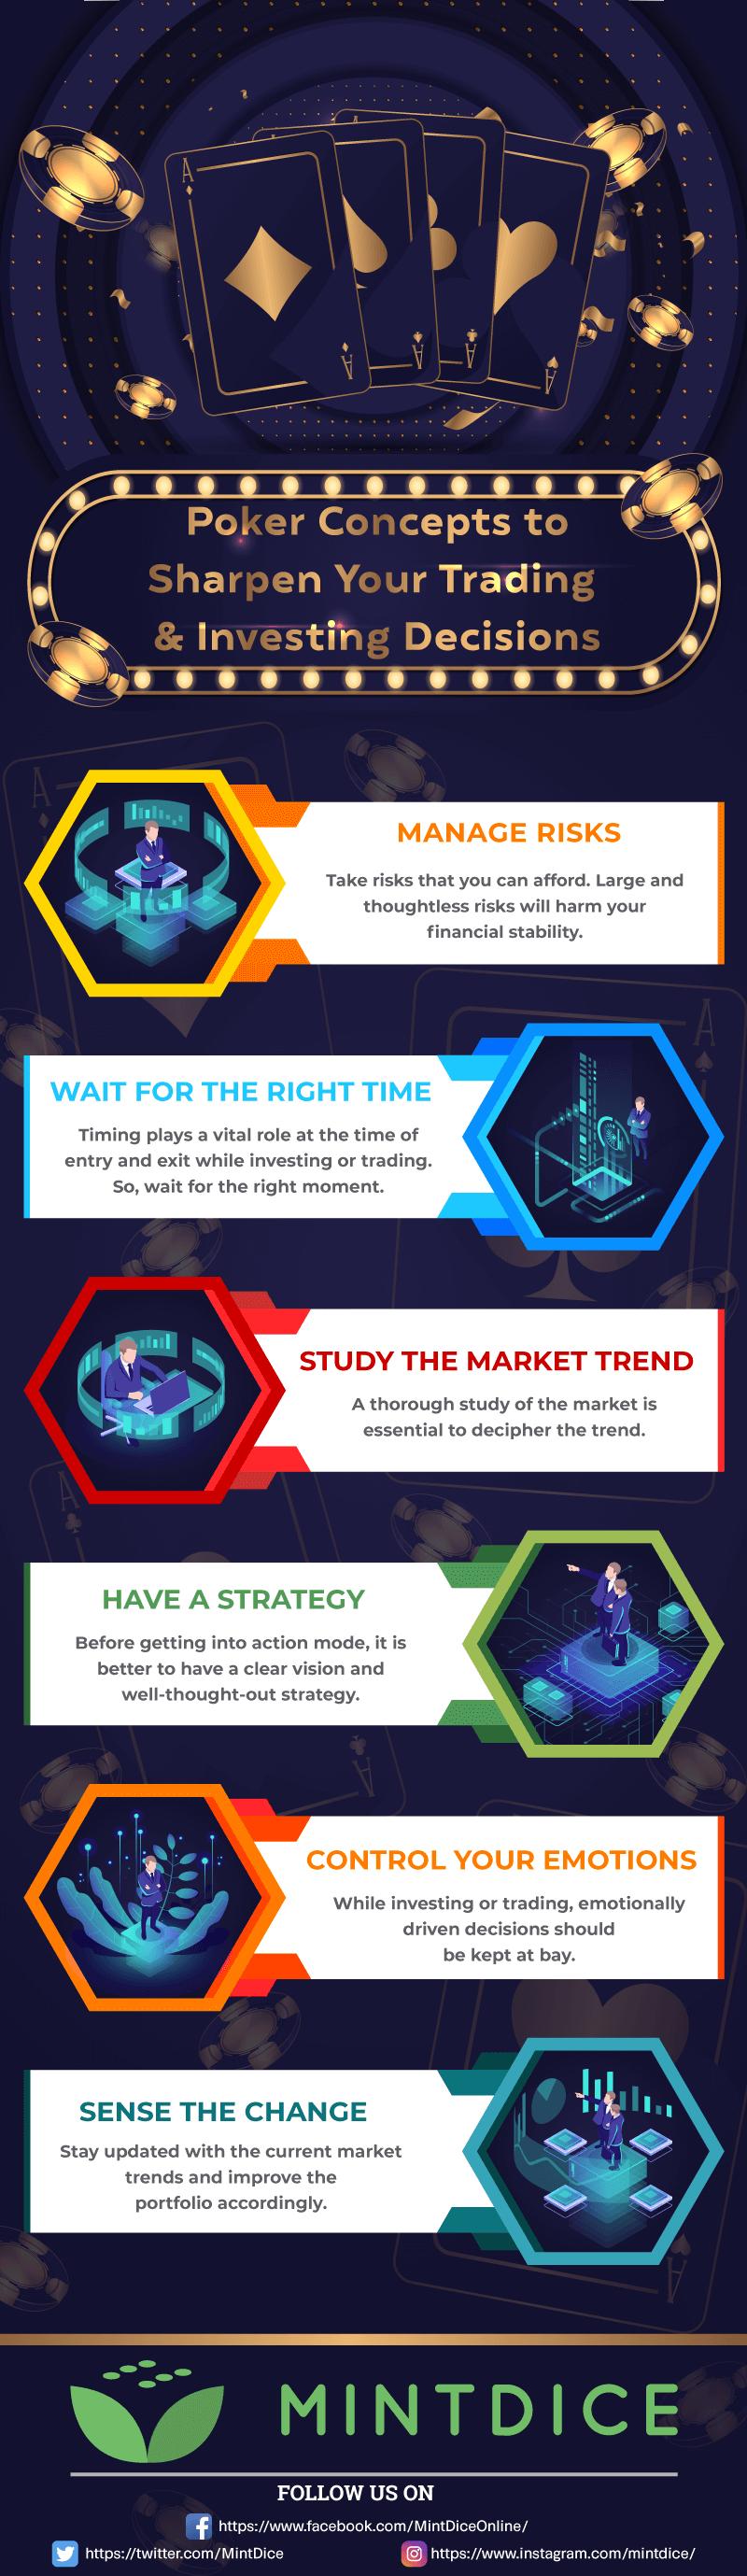 Poker concept Trading